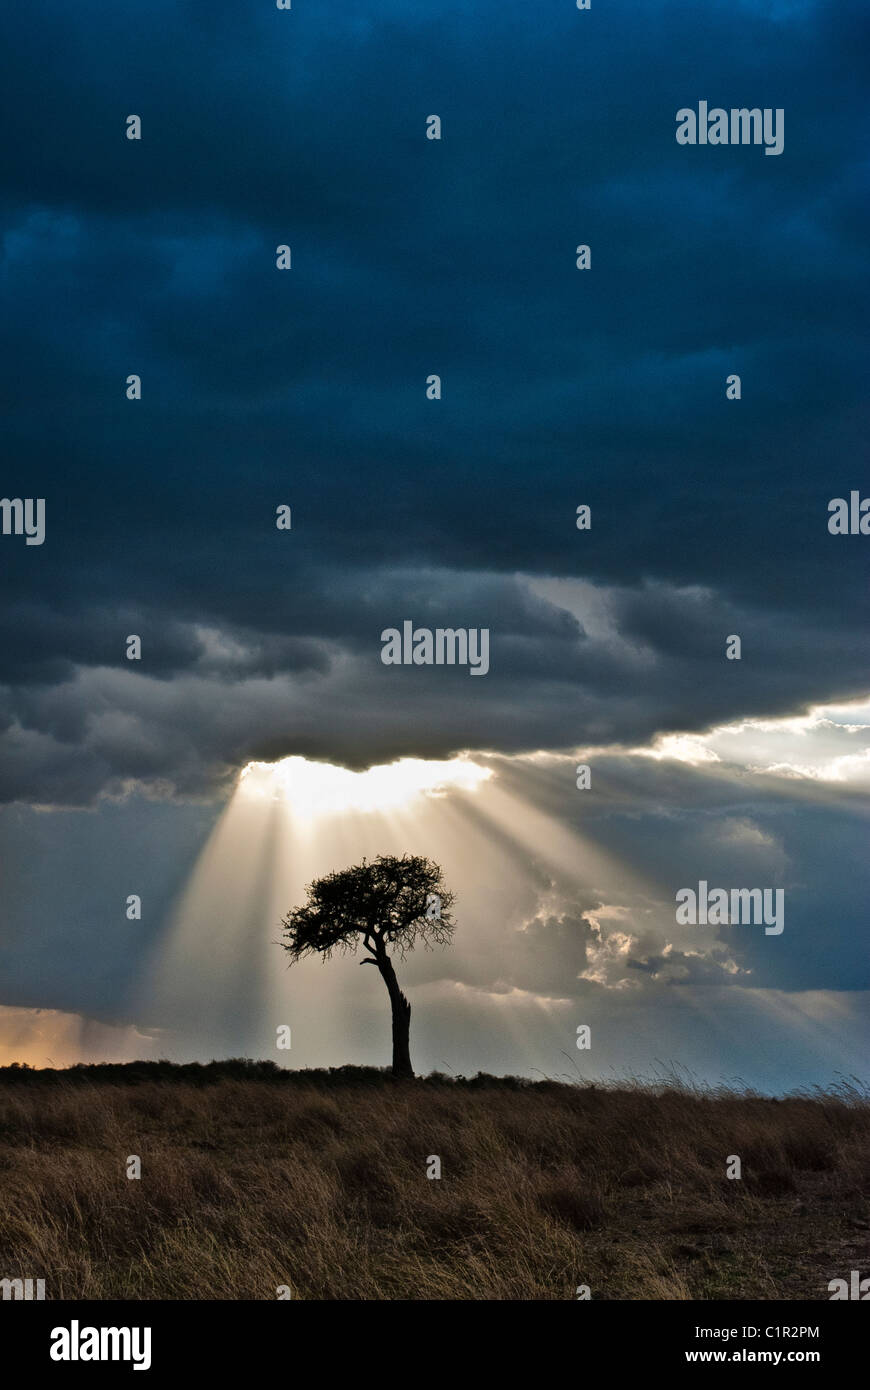 Einsame Akazie, Sturm und Sonnenstrahlen, Masai Mara National Reserve, Kenia, Afrika Stockbild